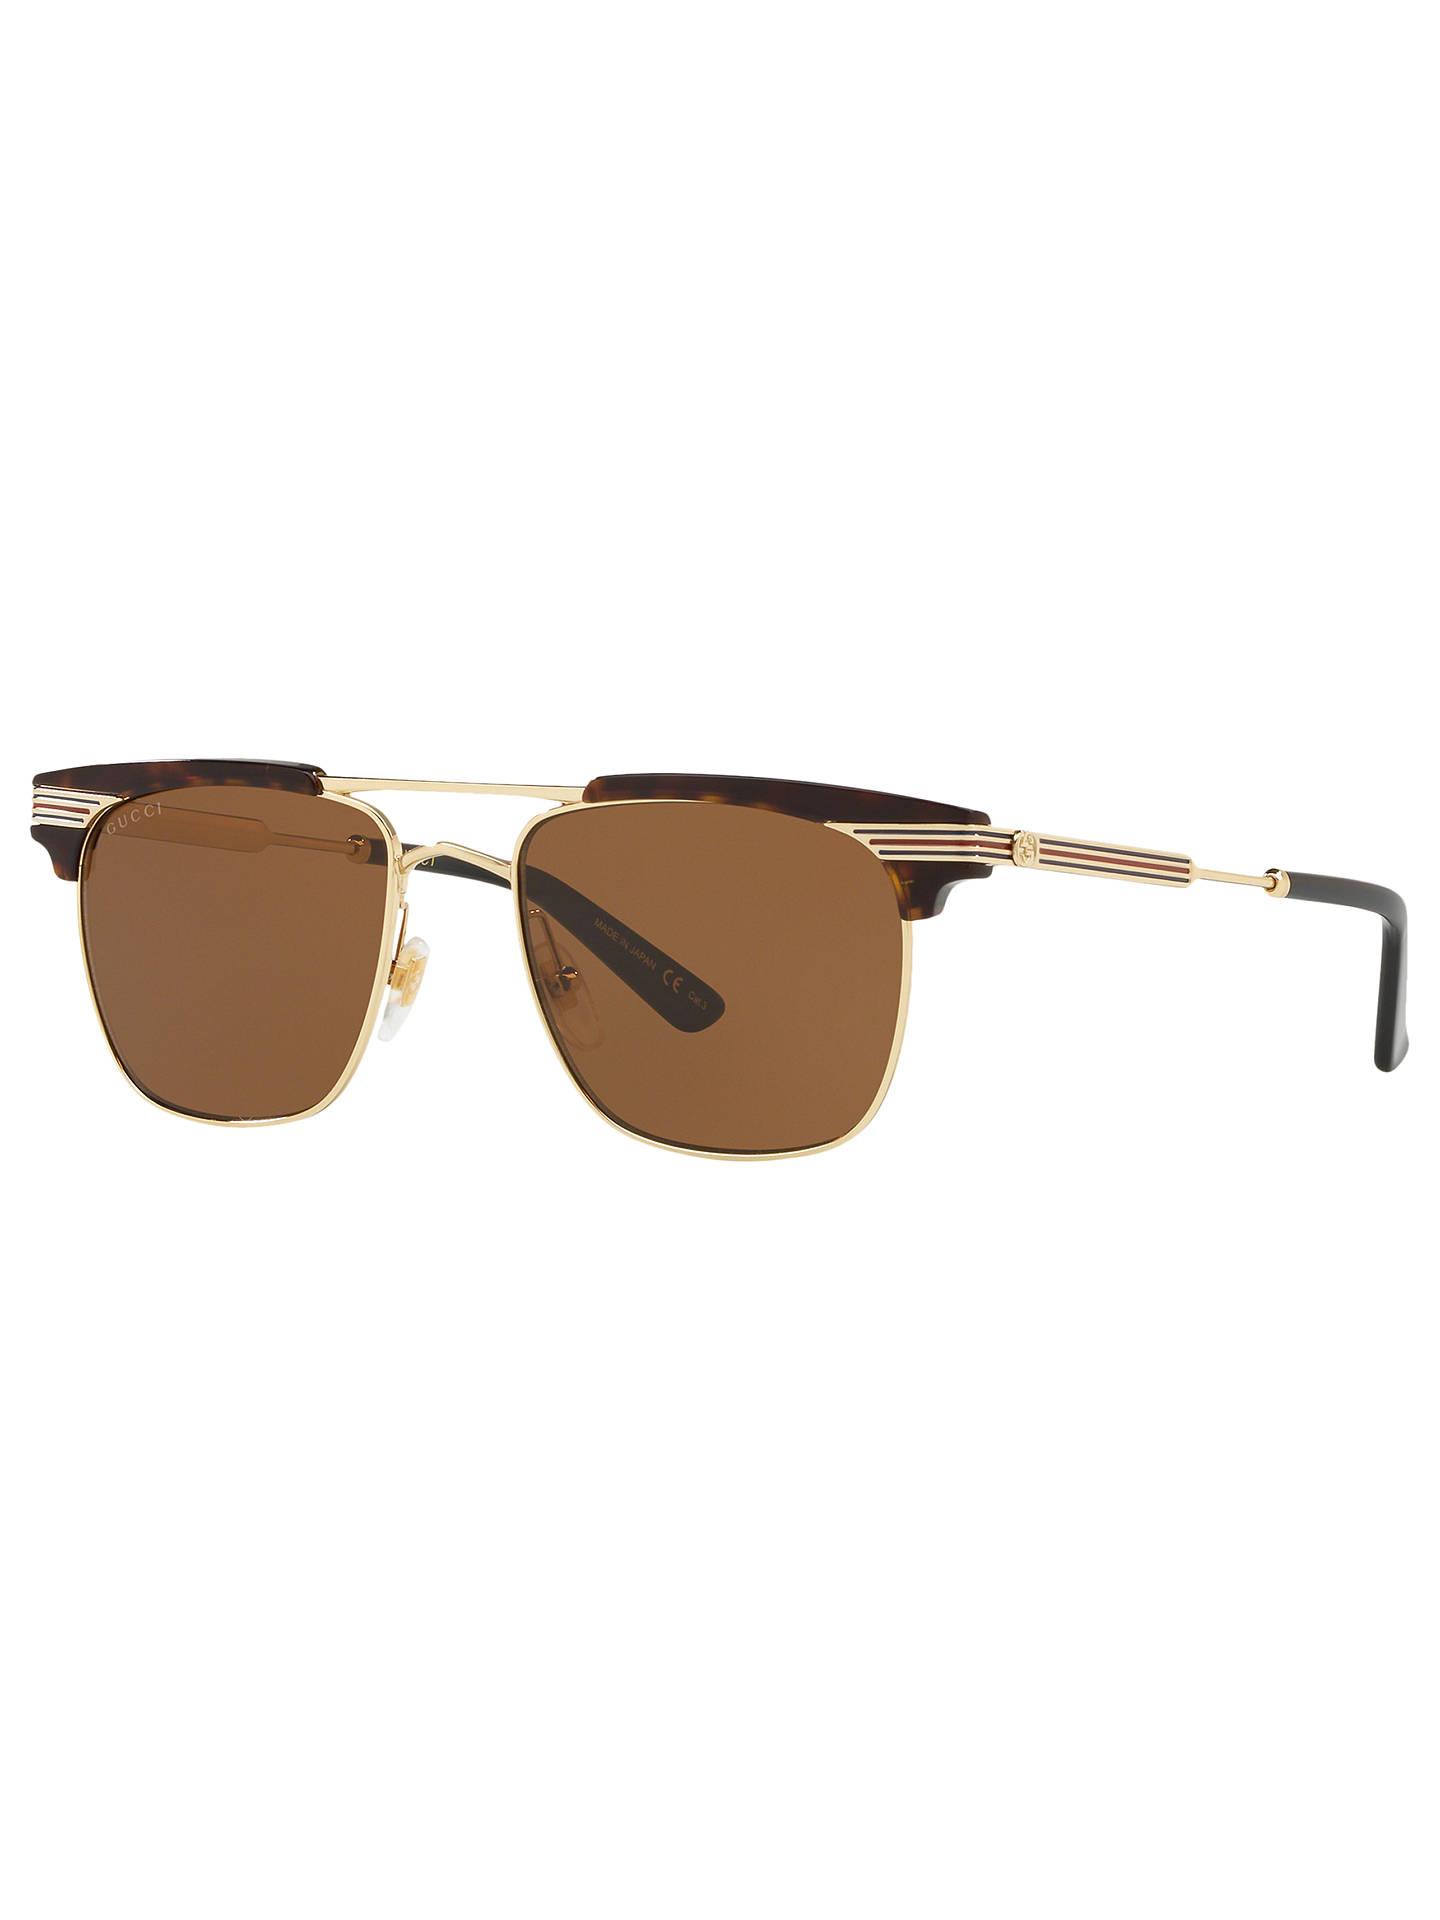 282bbc3f863 Buy Gucci GC001132 Men s Retangular Sunglasses